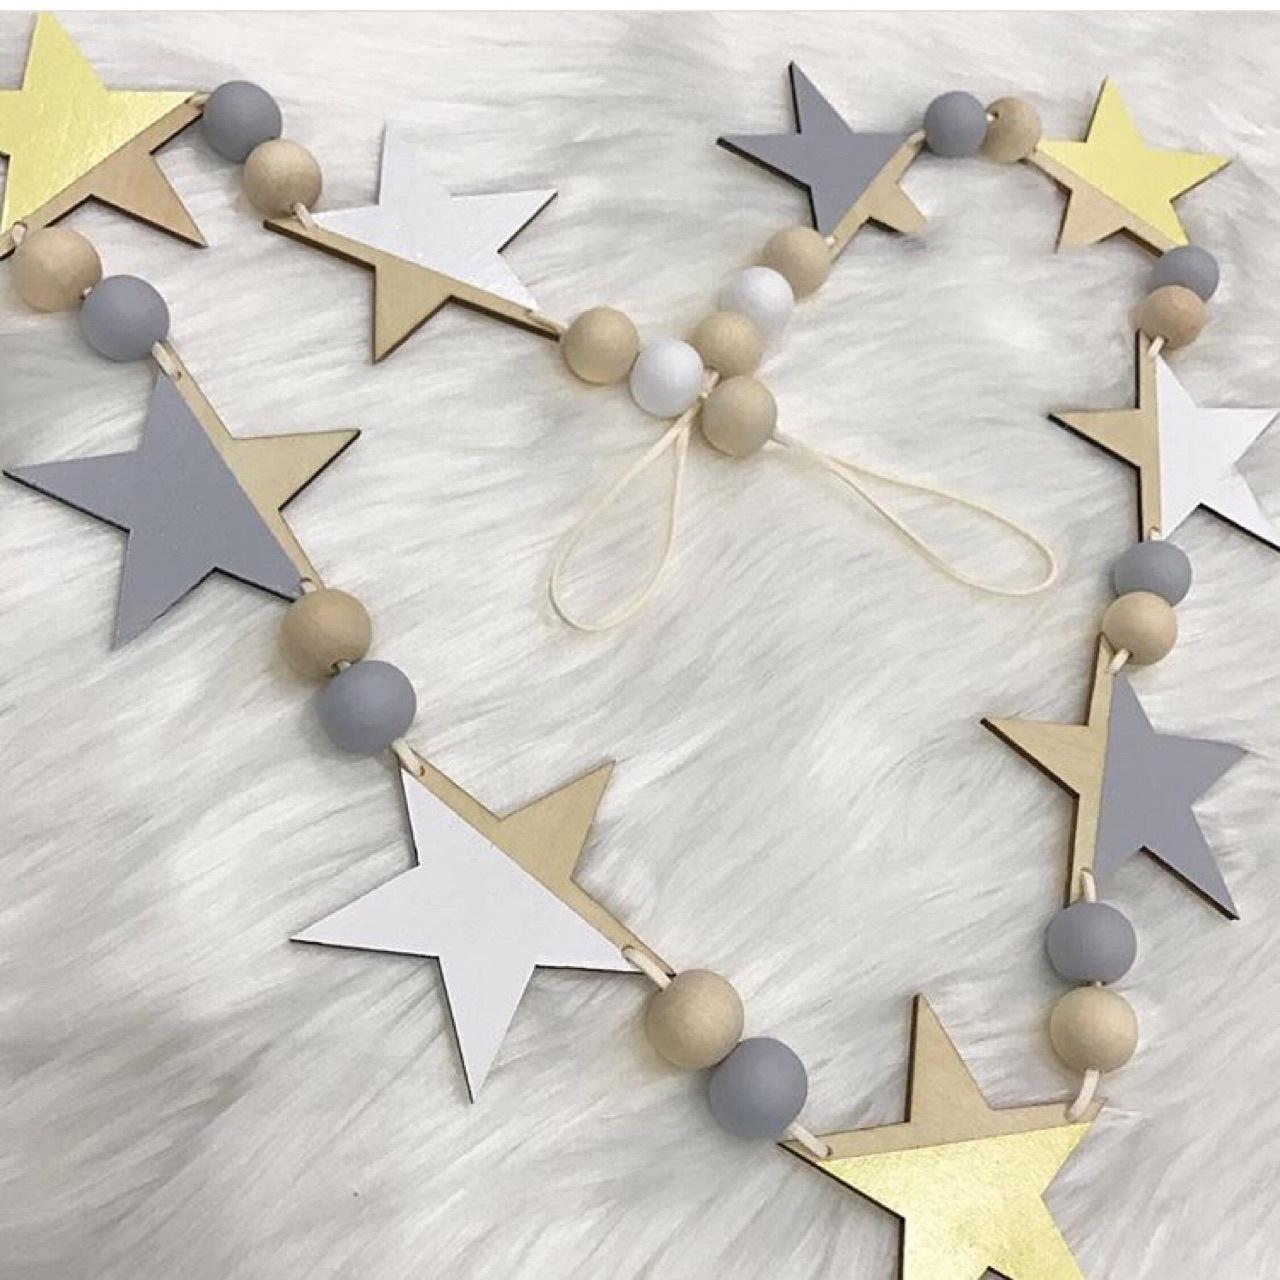 ins北欧风家居 木质星星横幅挂帘 儿童房童装店墙面装饰帐篷道具